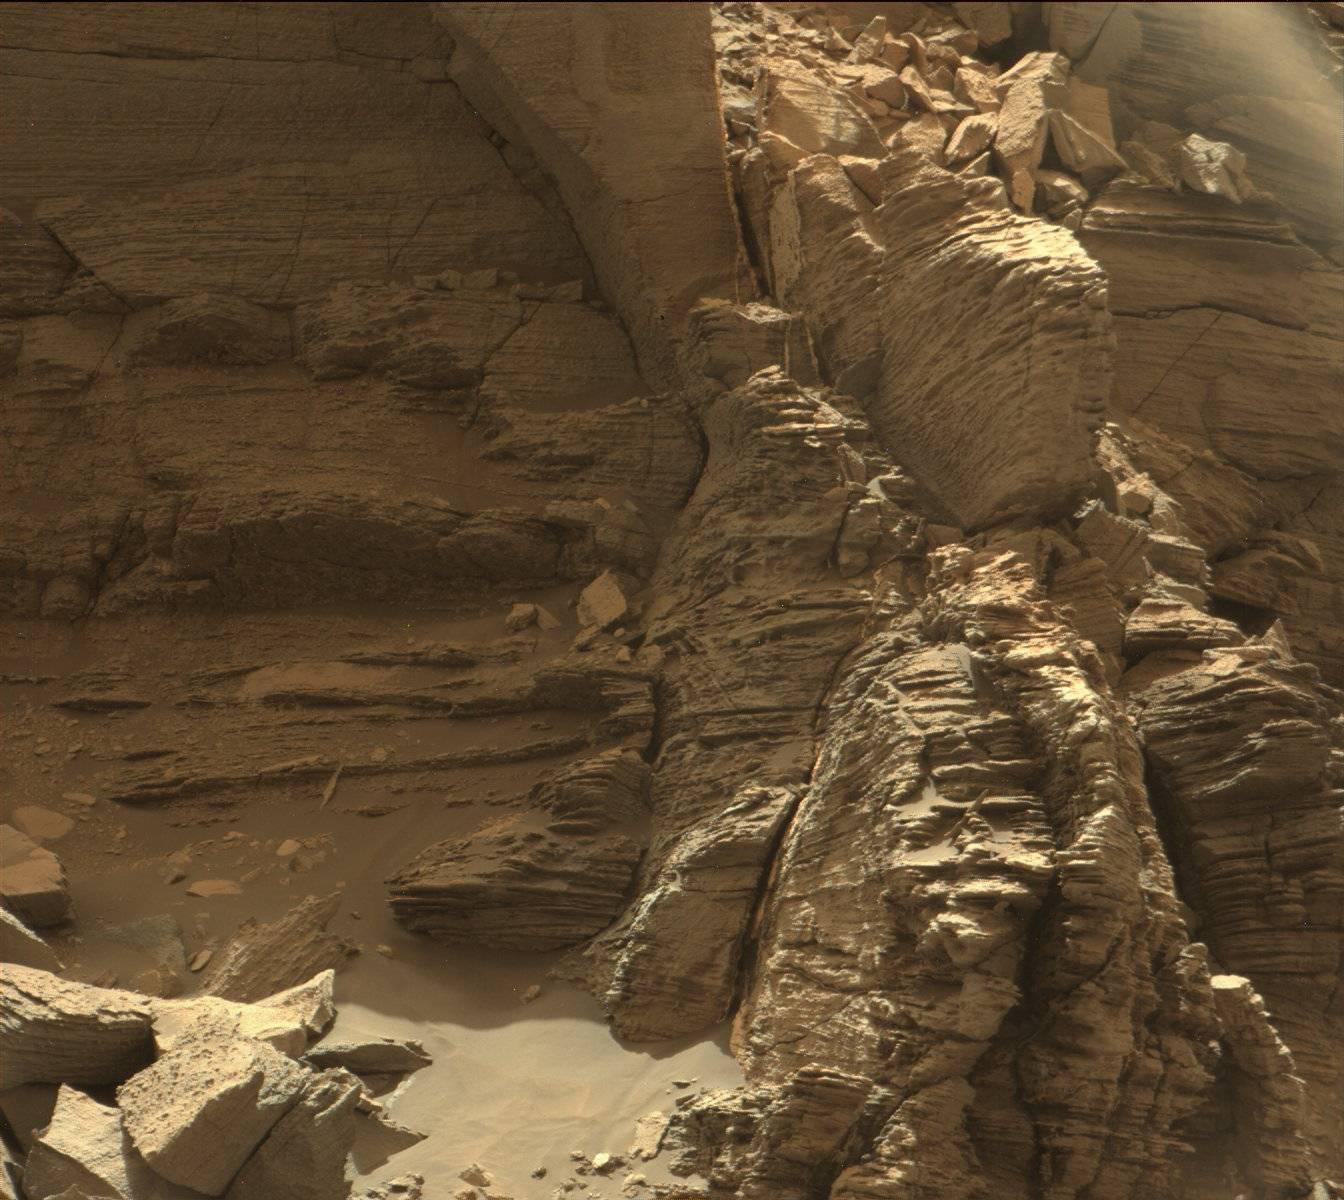 mars exploration rover news - photo #18